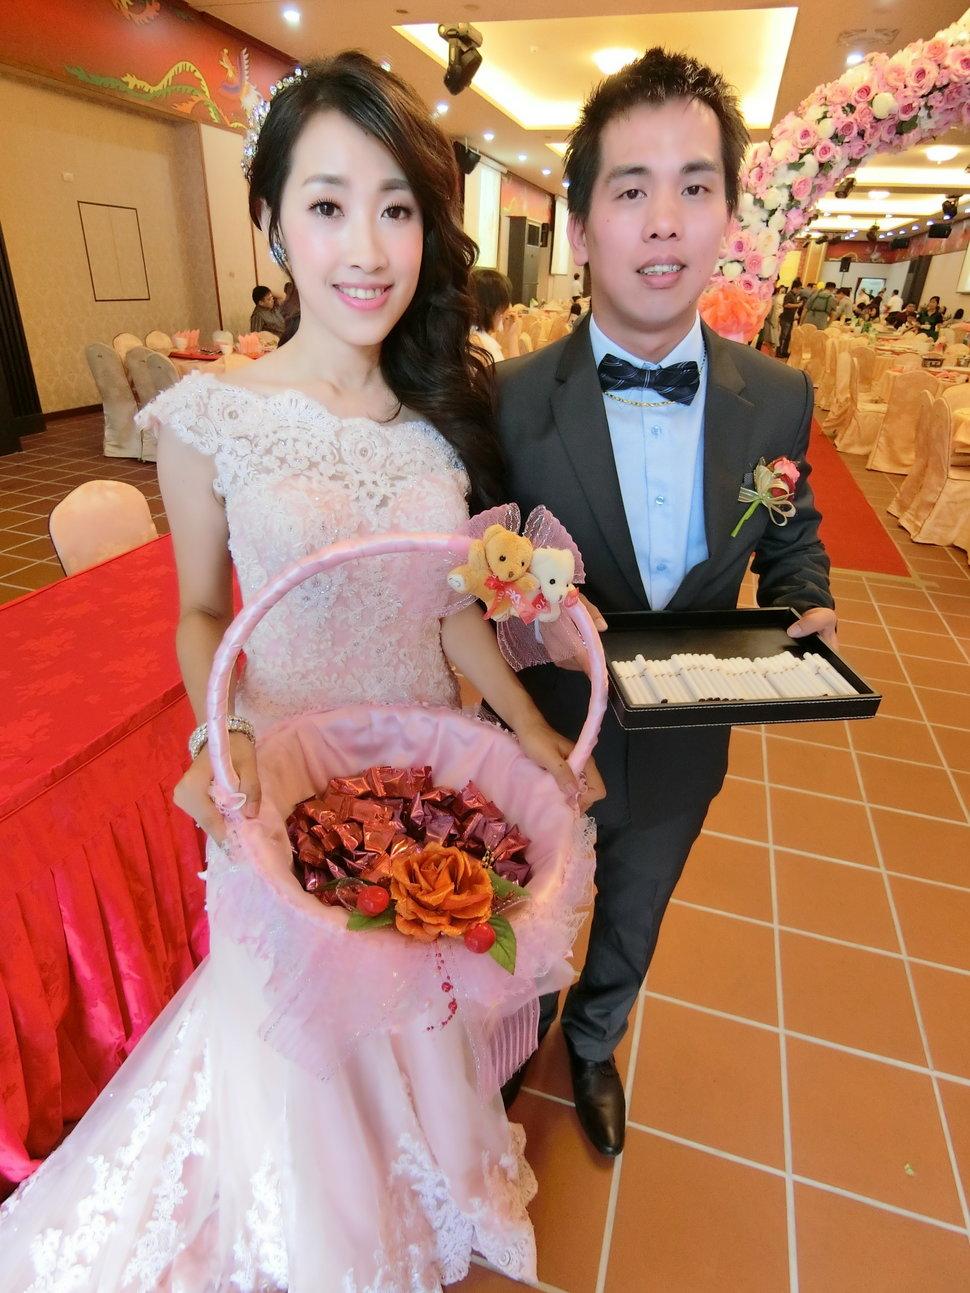 CIMG5084 - 新竹🎀Nemo新娘秘書服務🎀 - 結婚吧